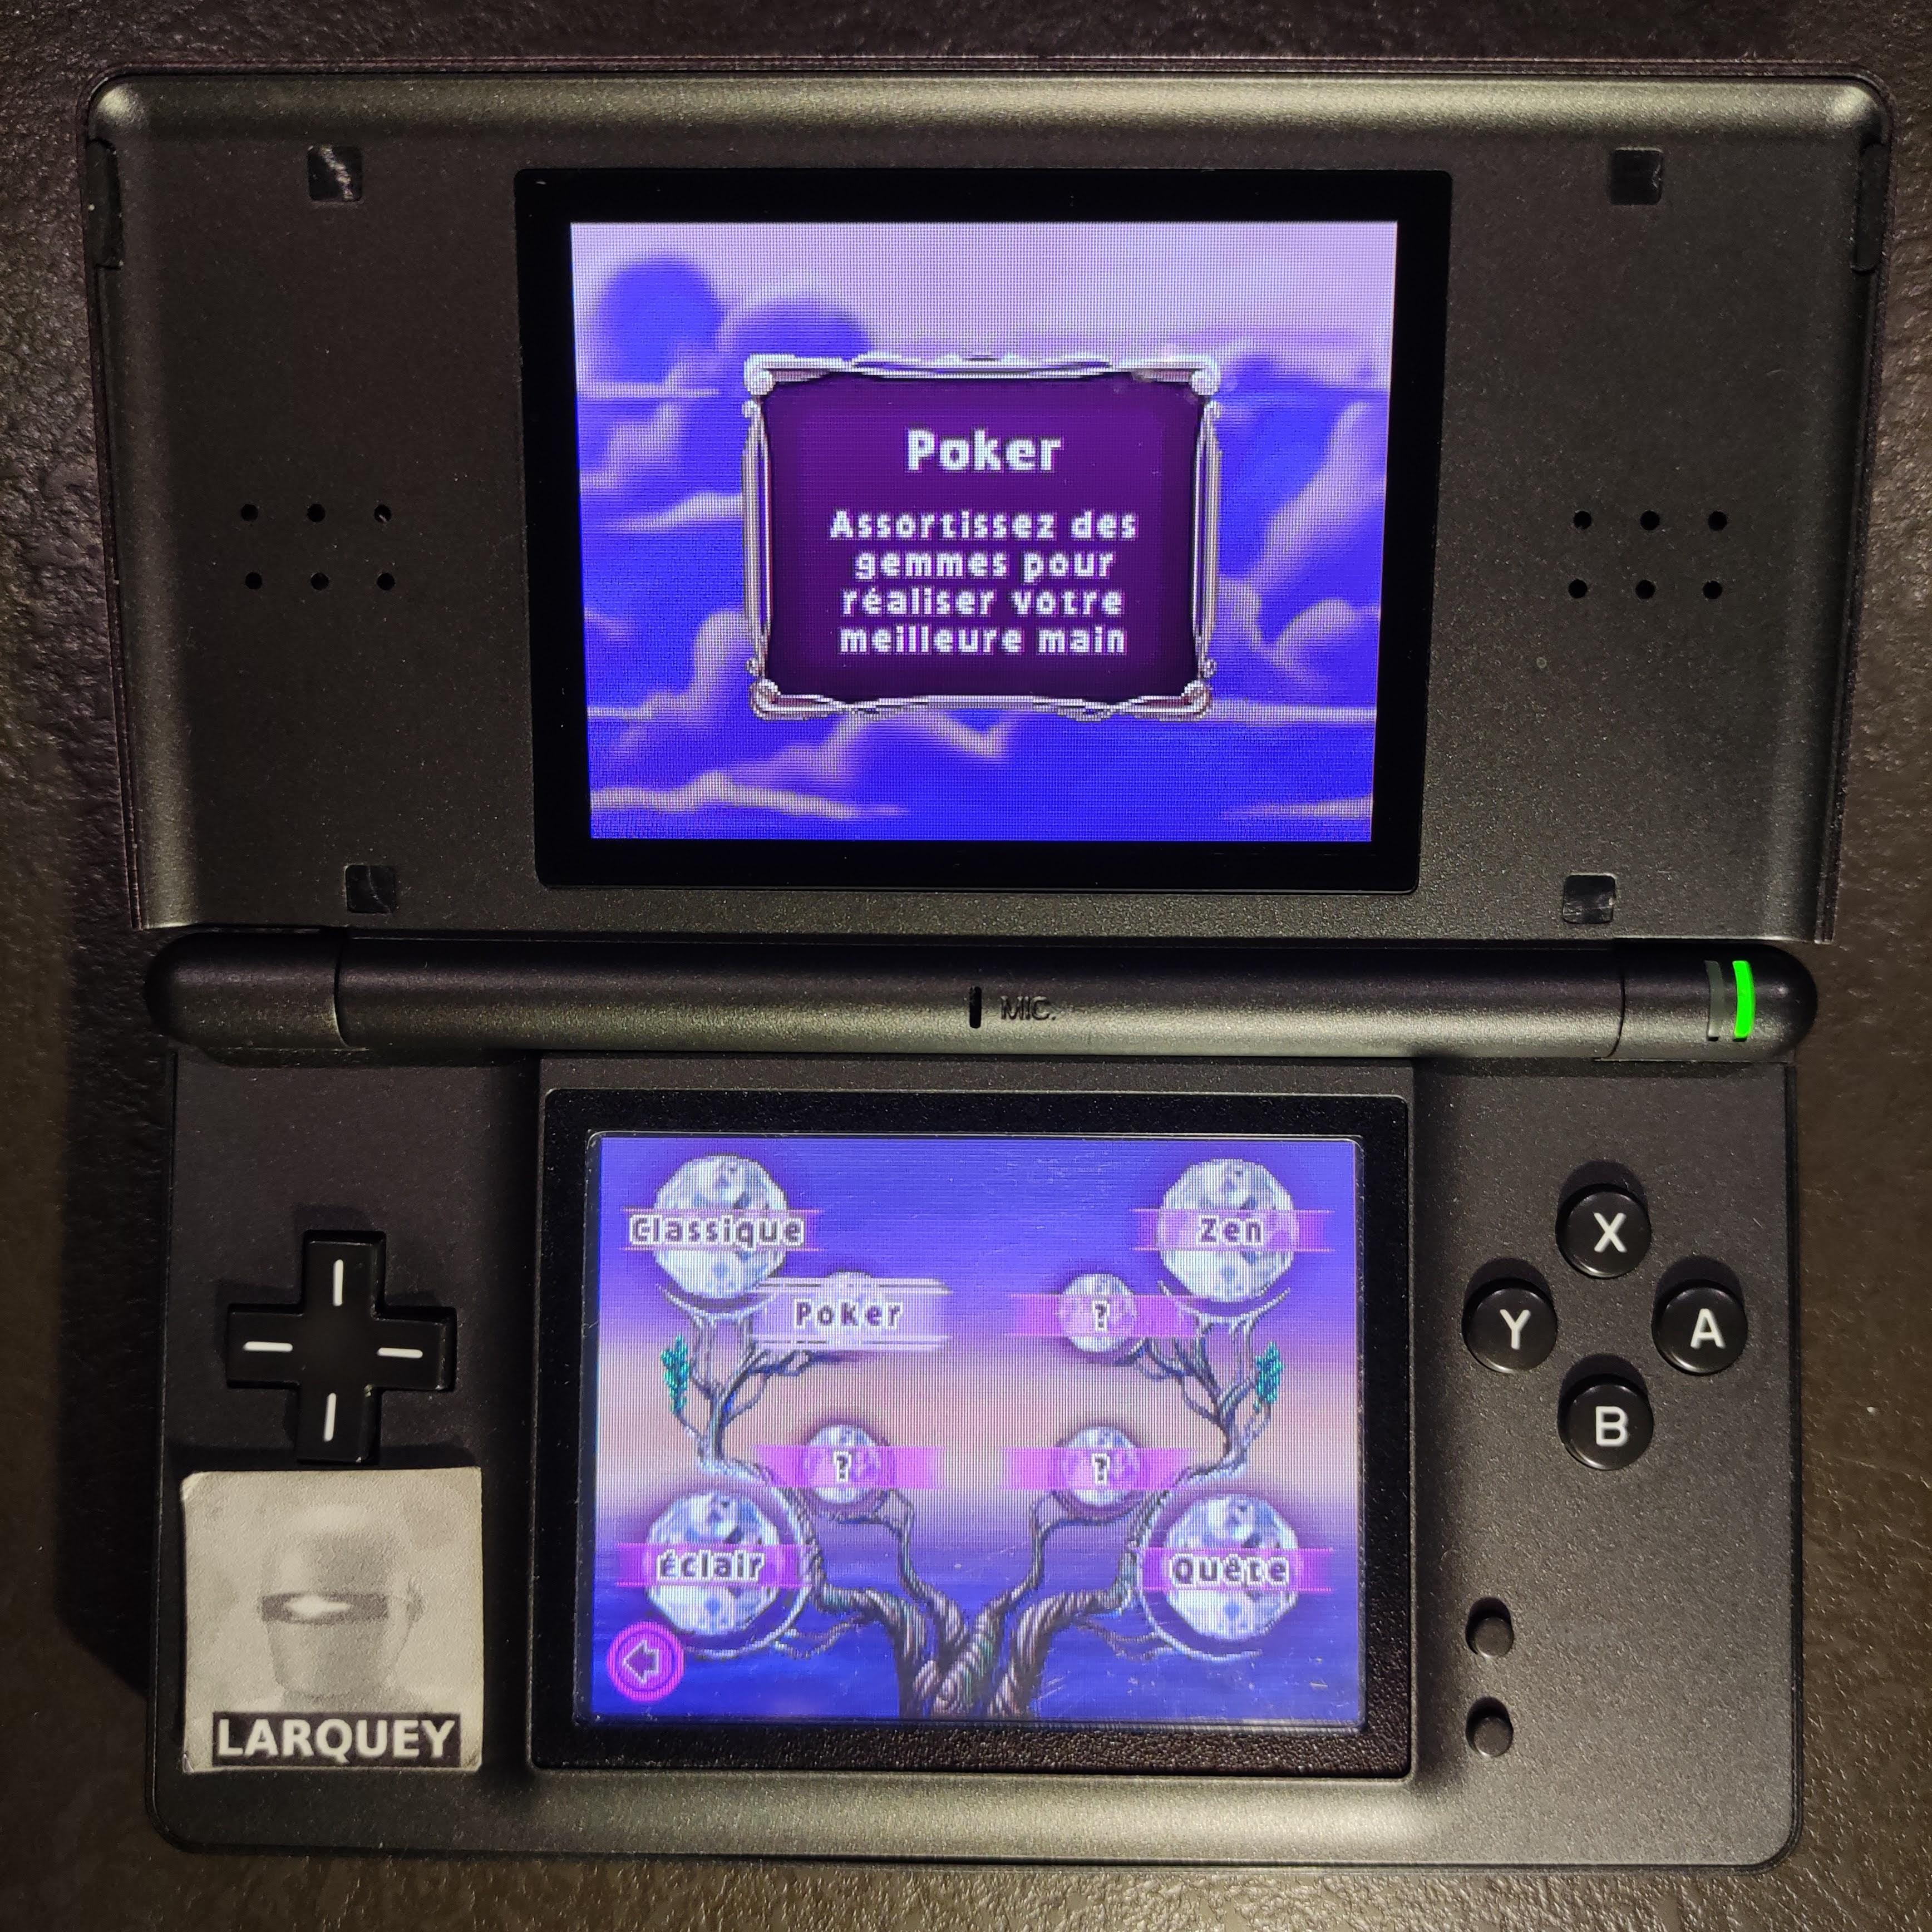 Larquey: Bejeweled 3: Poker [Skull Coin Flips] (Nintendo DS) 2 points on 2020-09-26 04:05:48